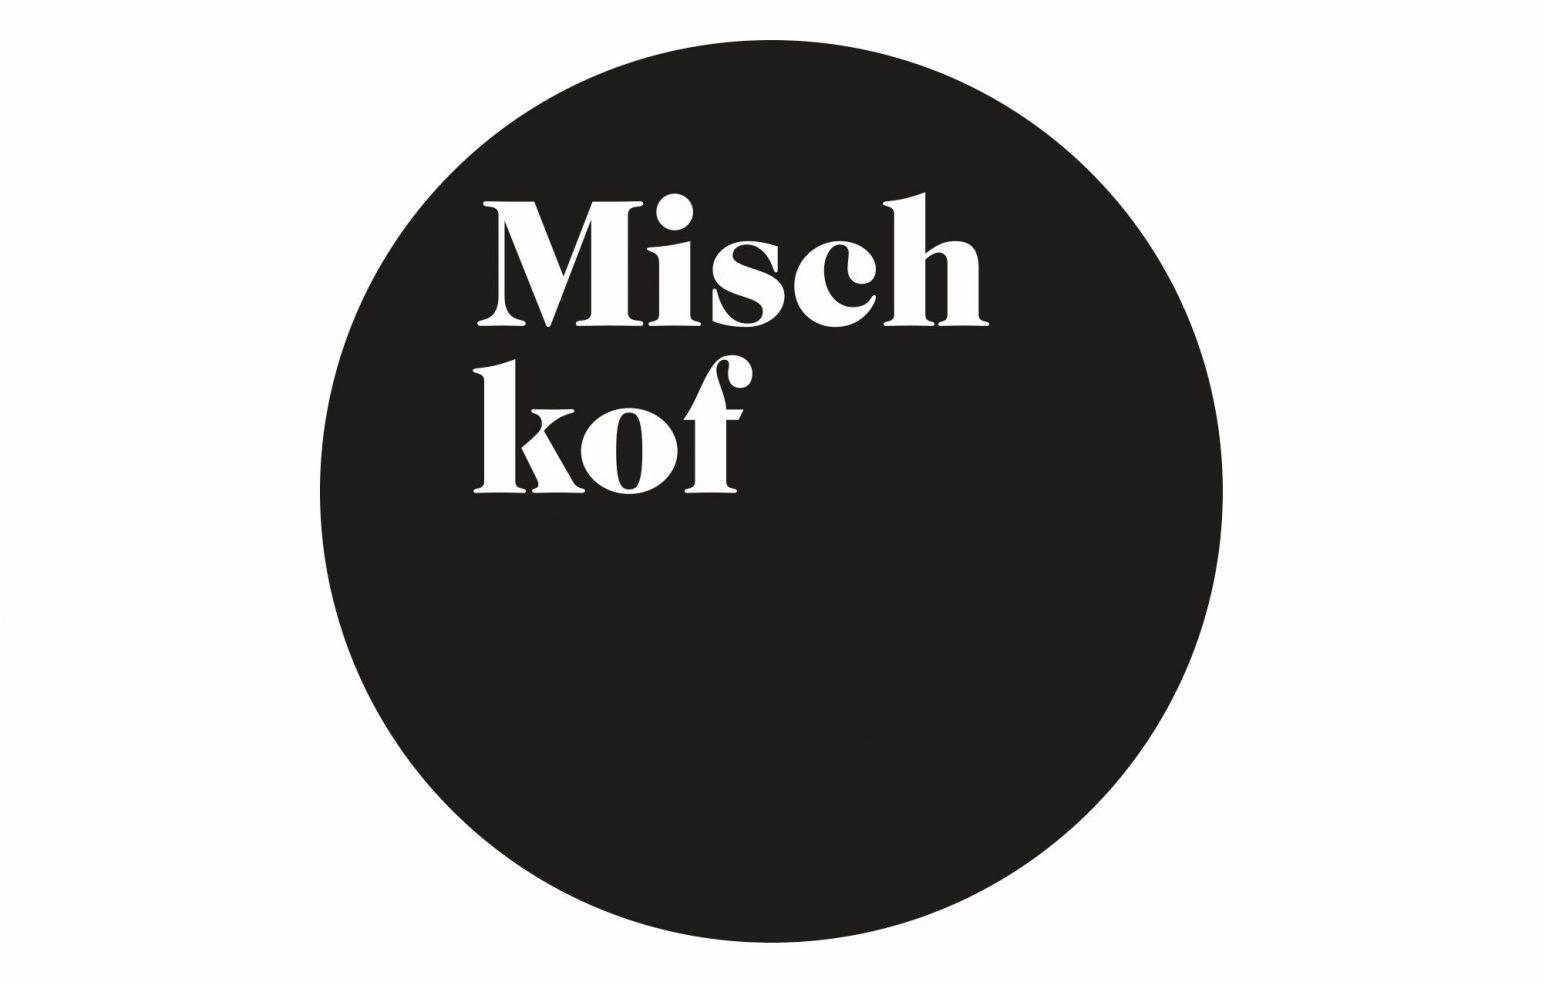 Mischkof-16-rasmusundchristin